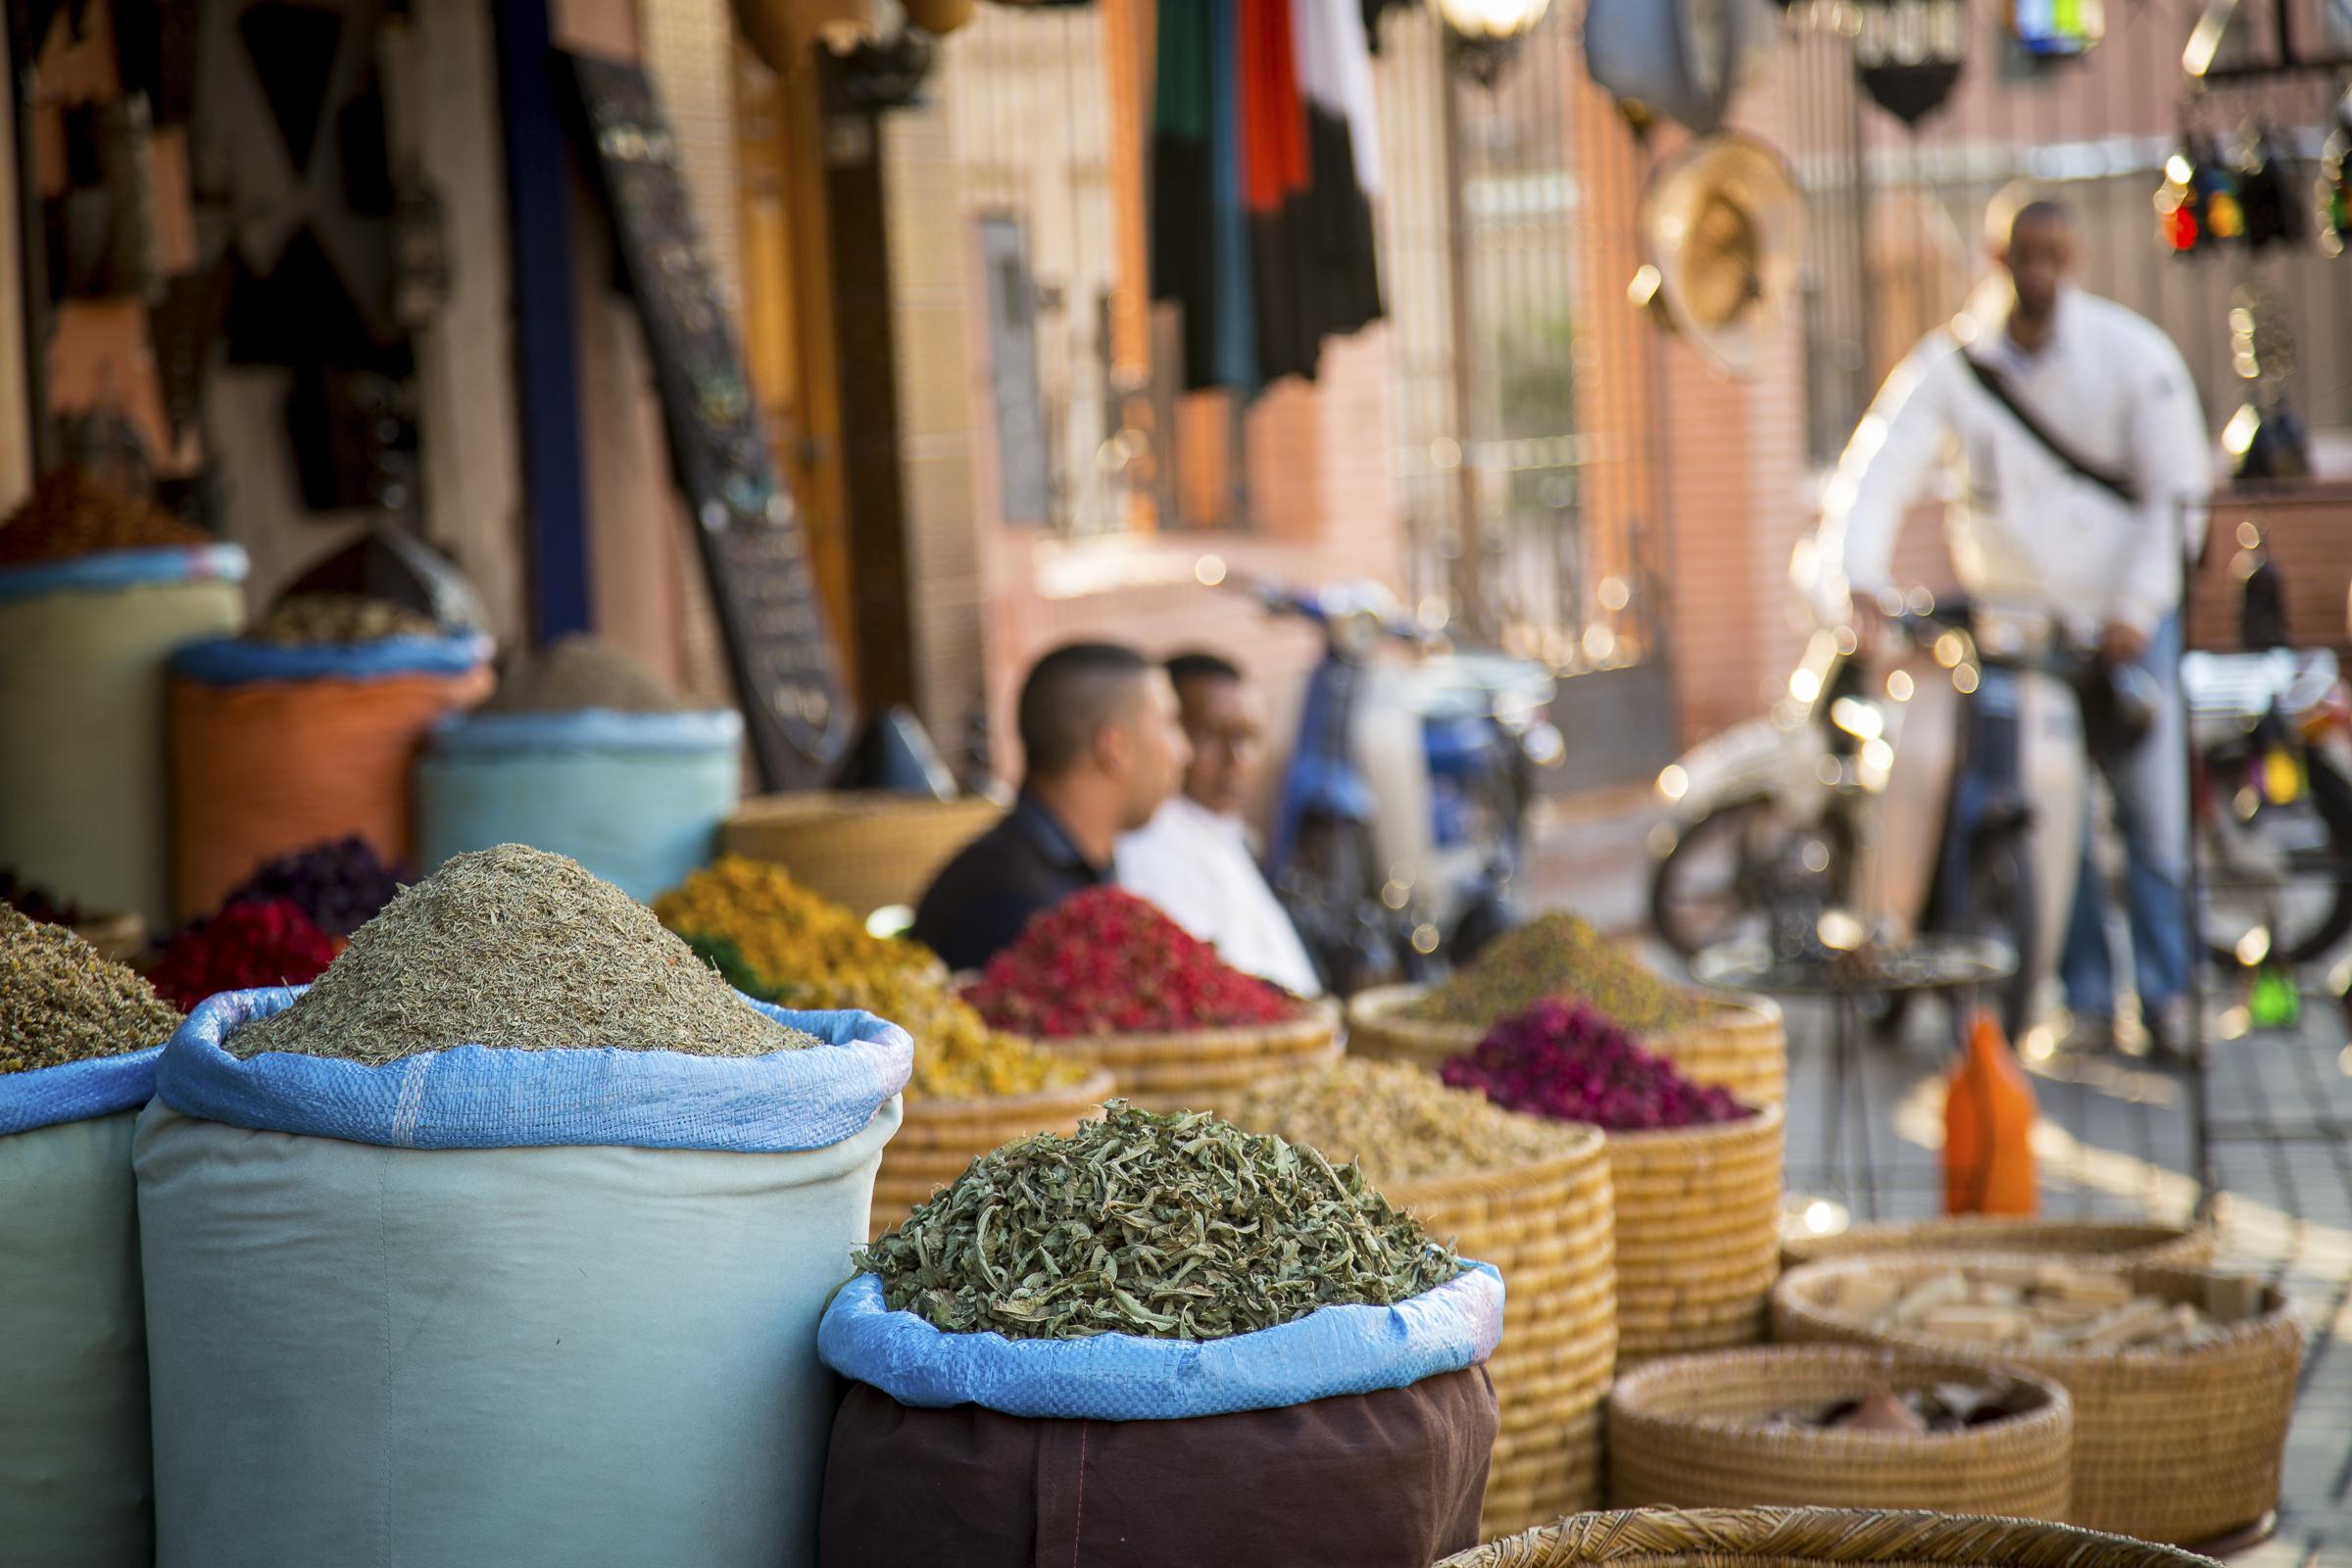 Herb alley. Medina, Marrakech